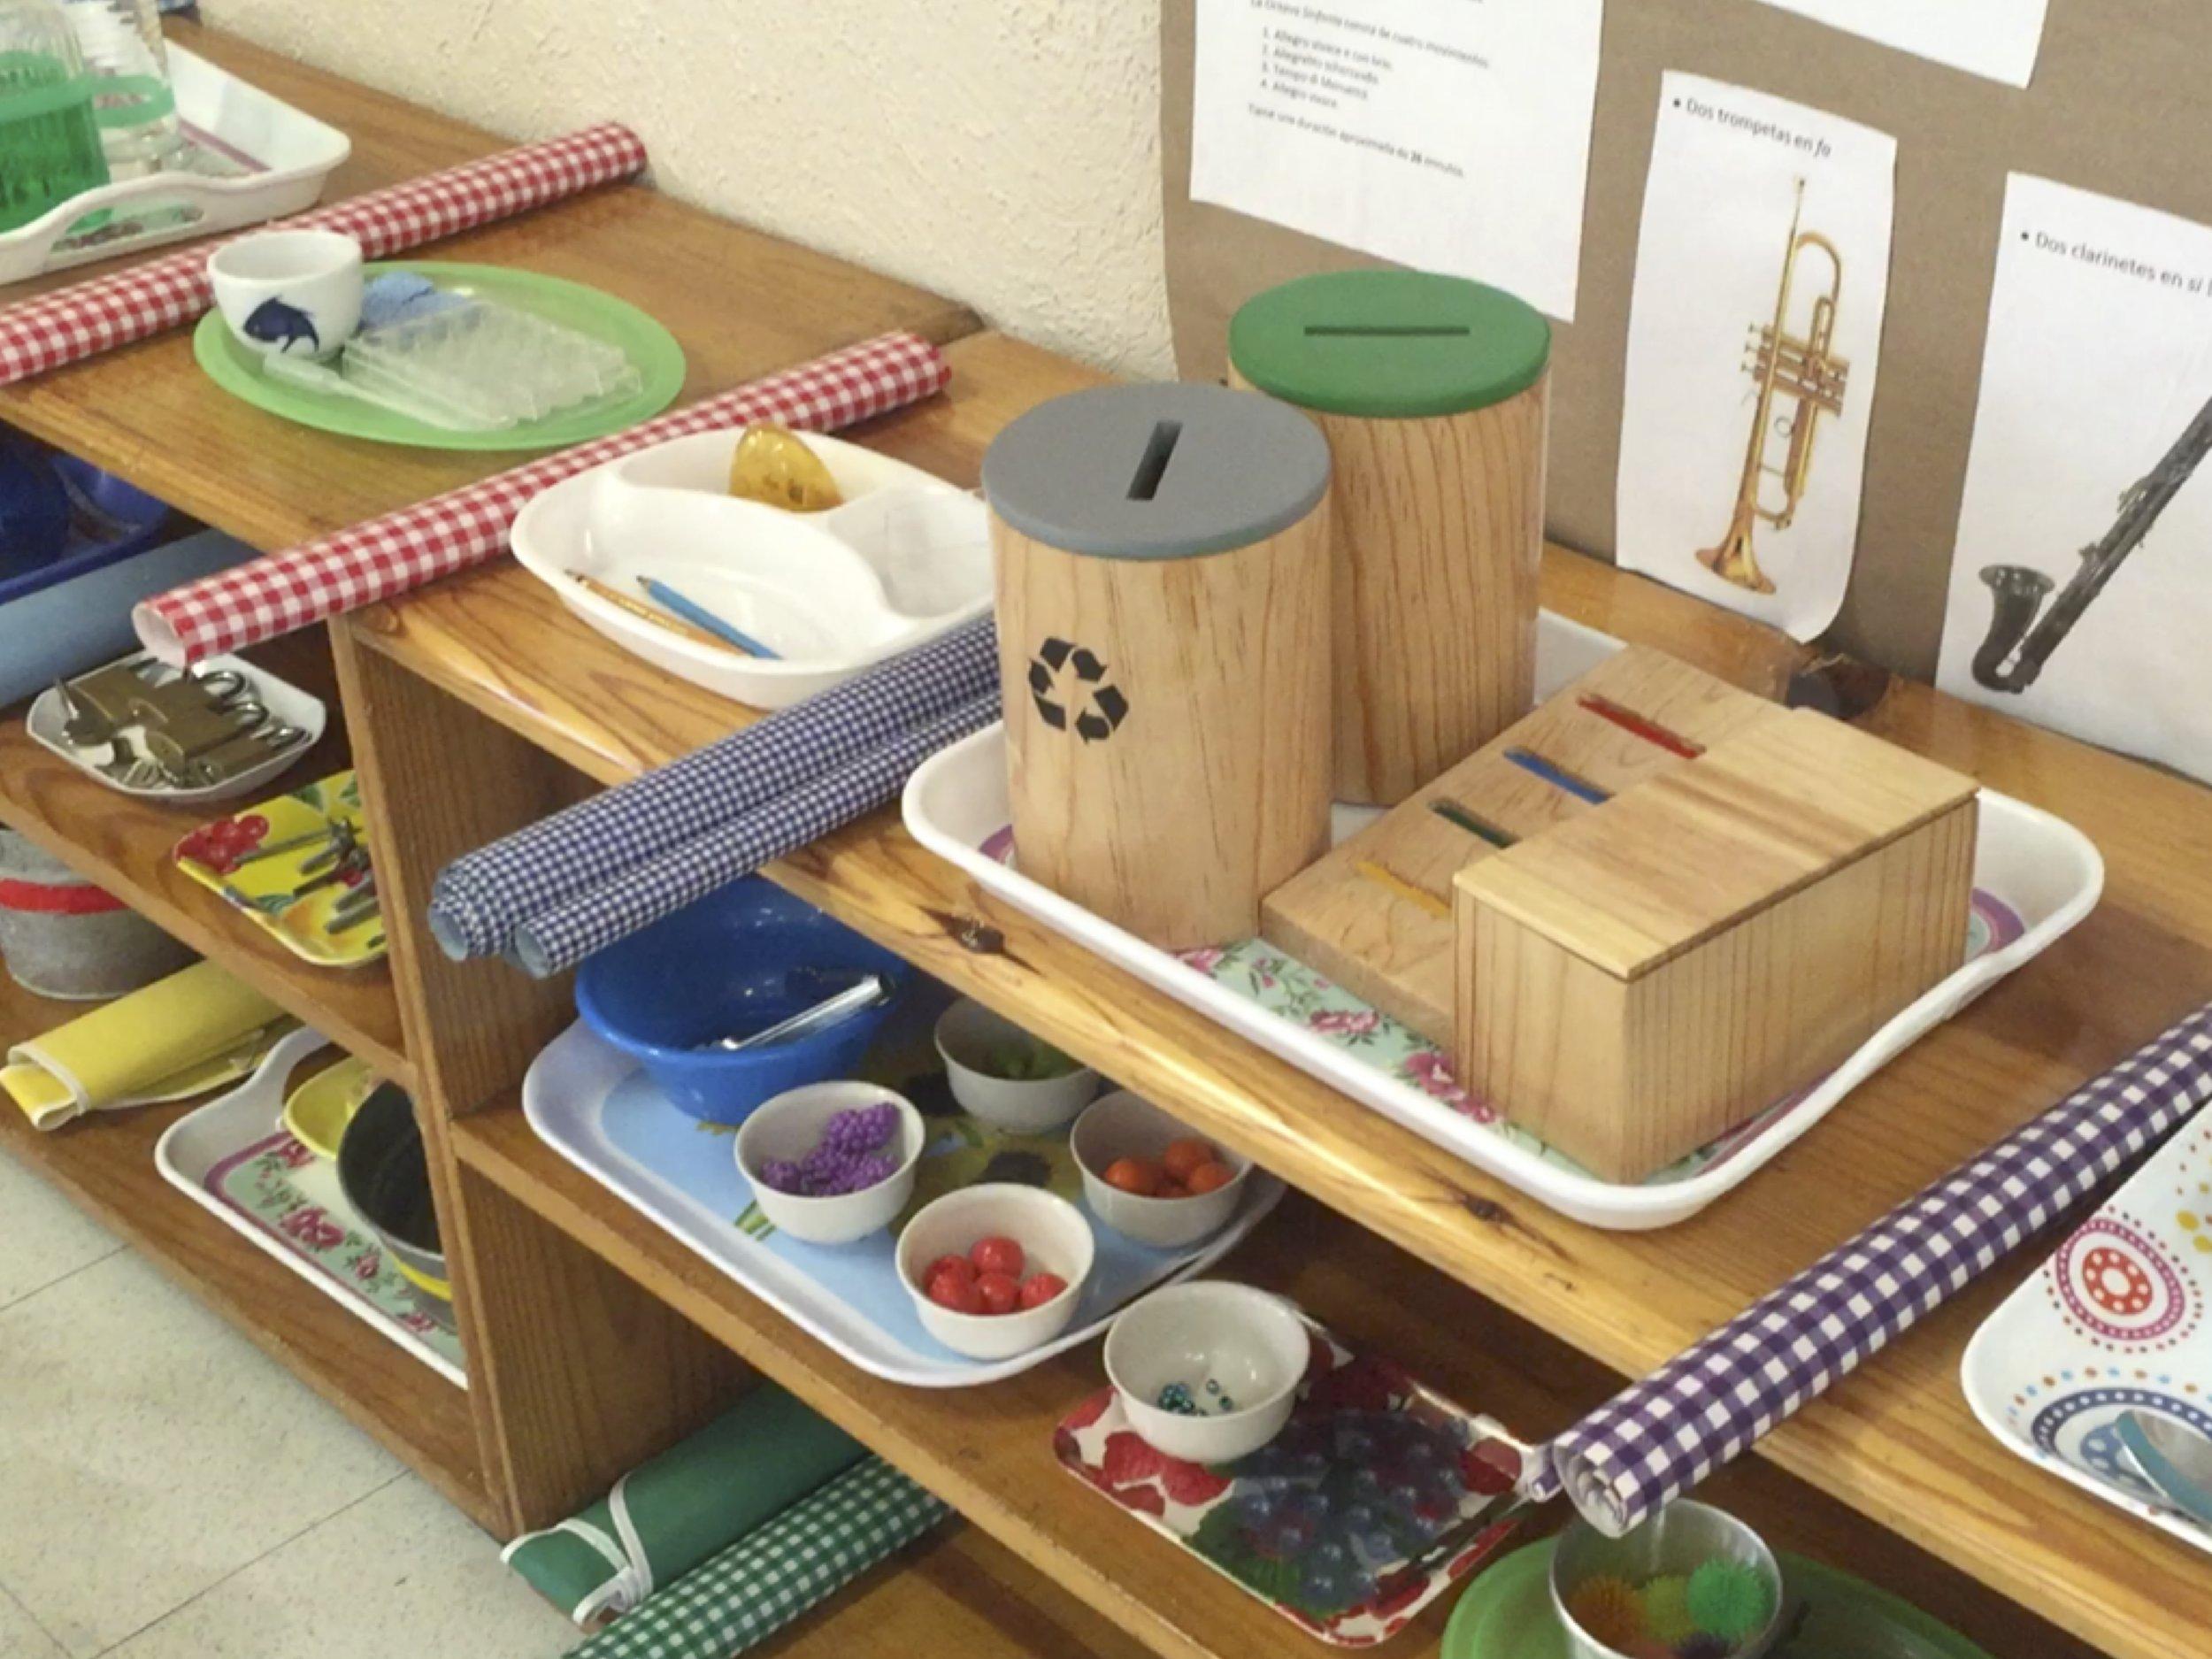 Material Montessori Separacion de basura2.jpg